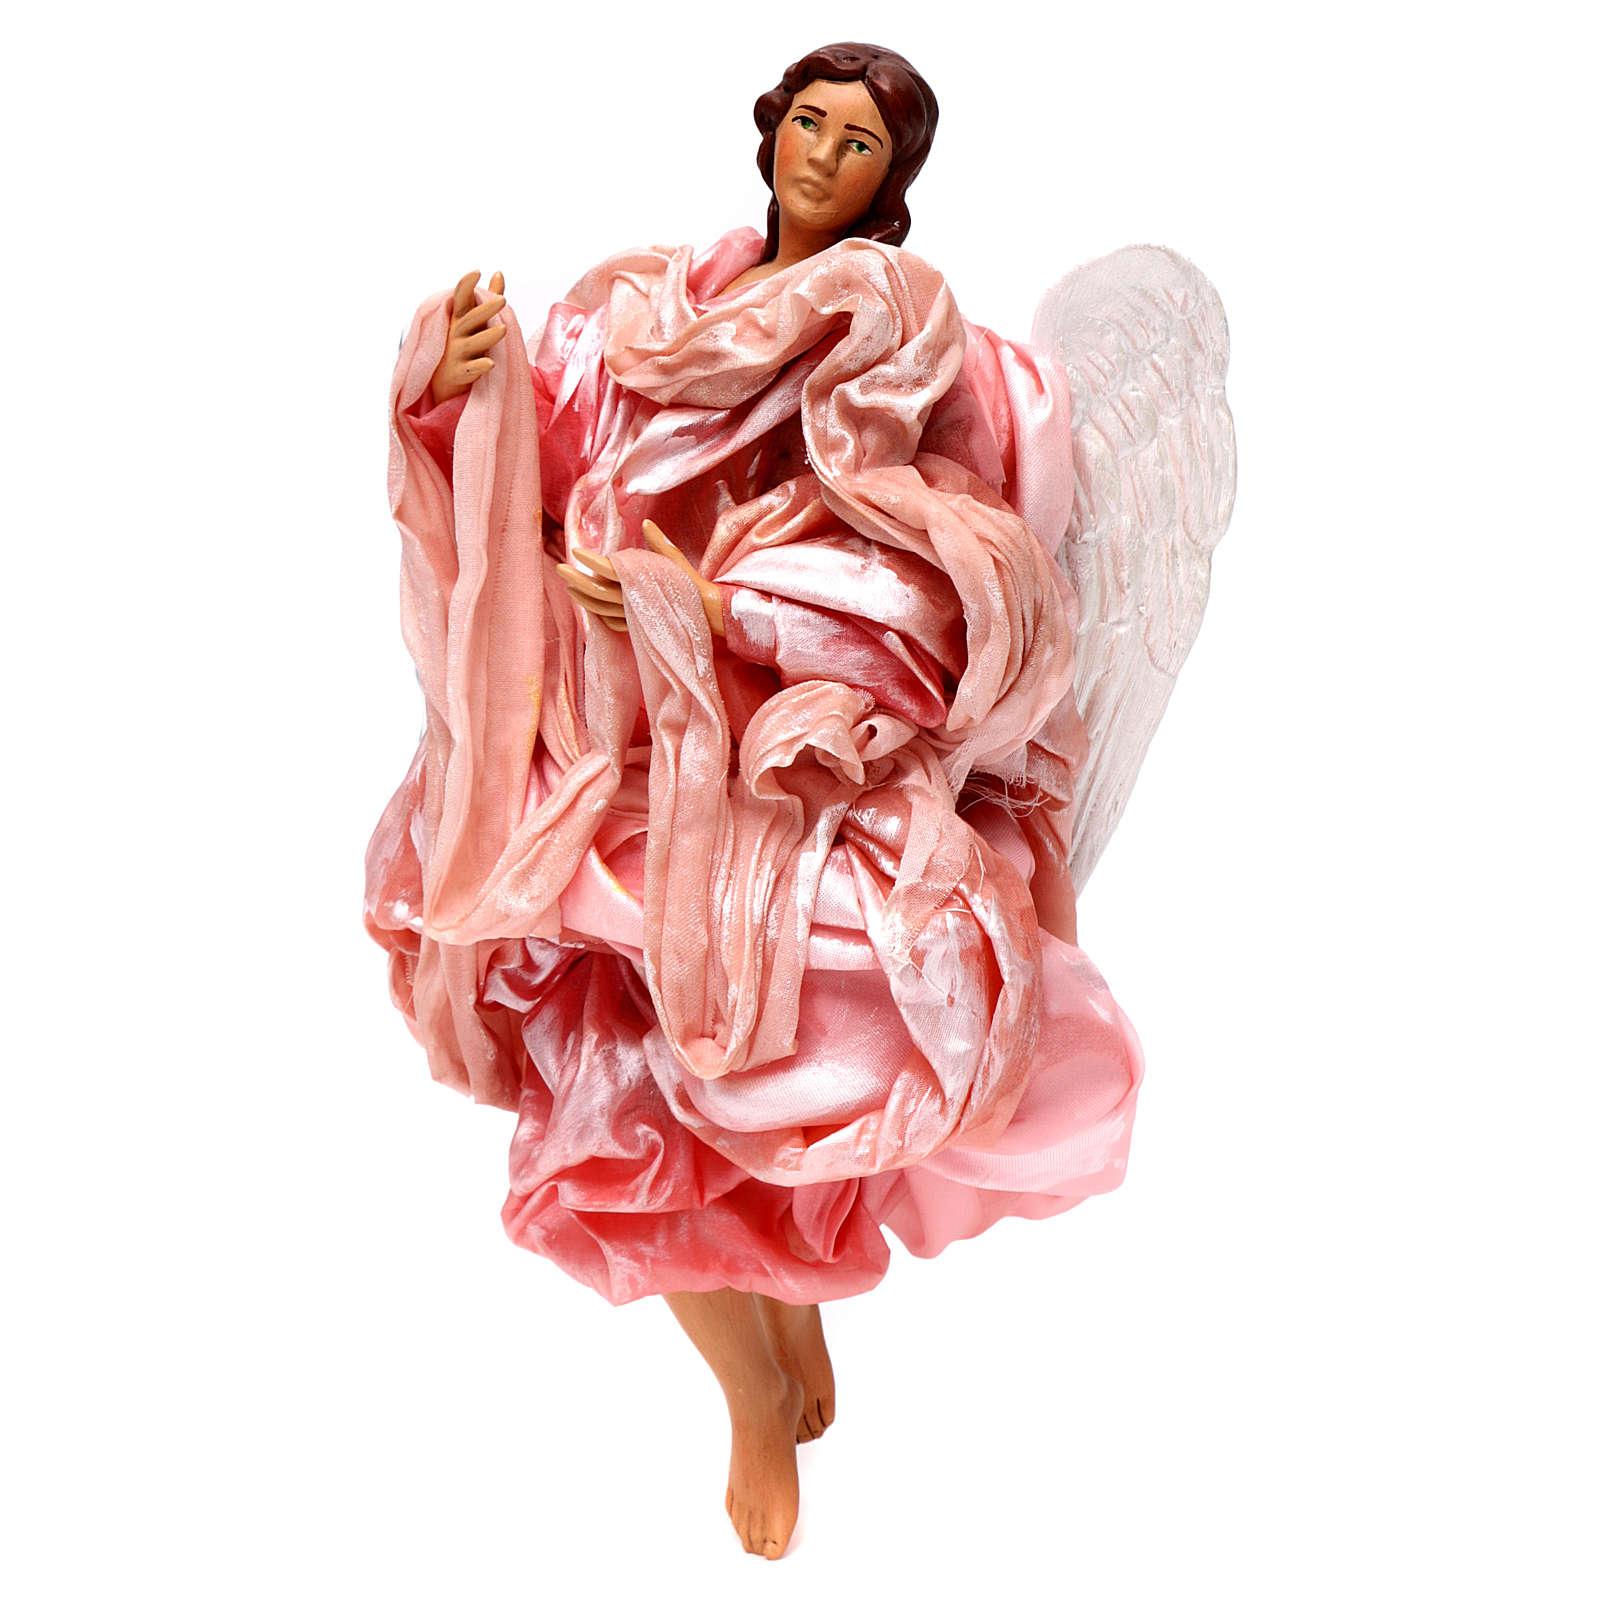 Angelo rosa 30 cm presepe napoletano 4